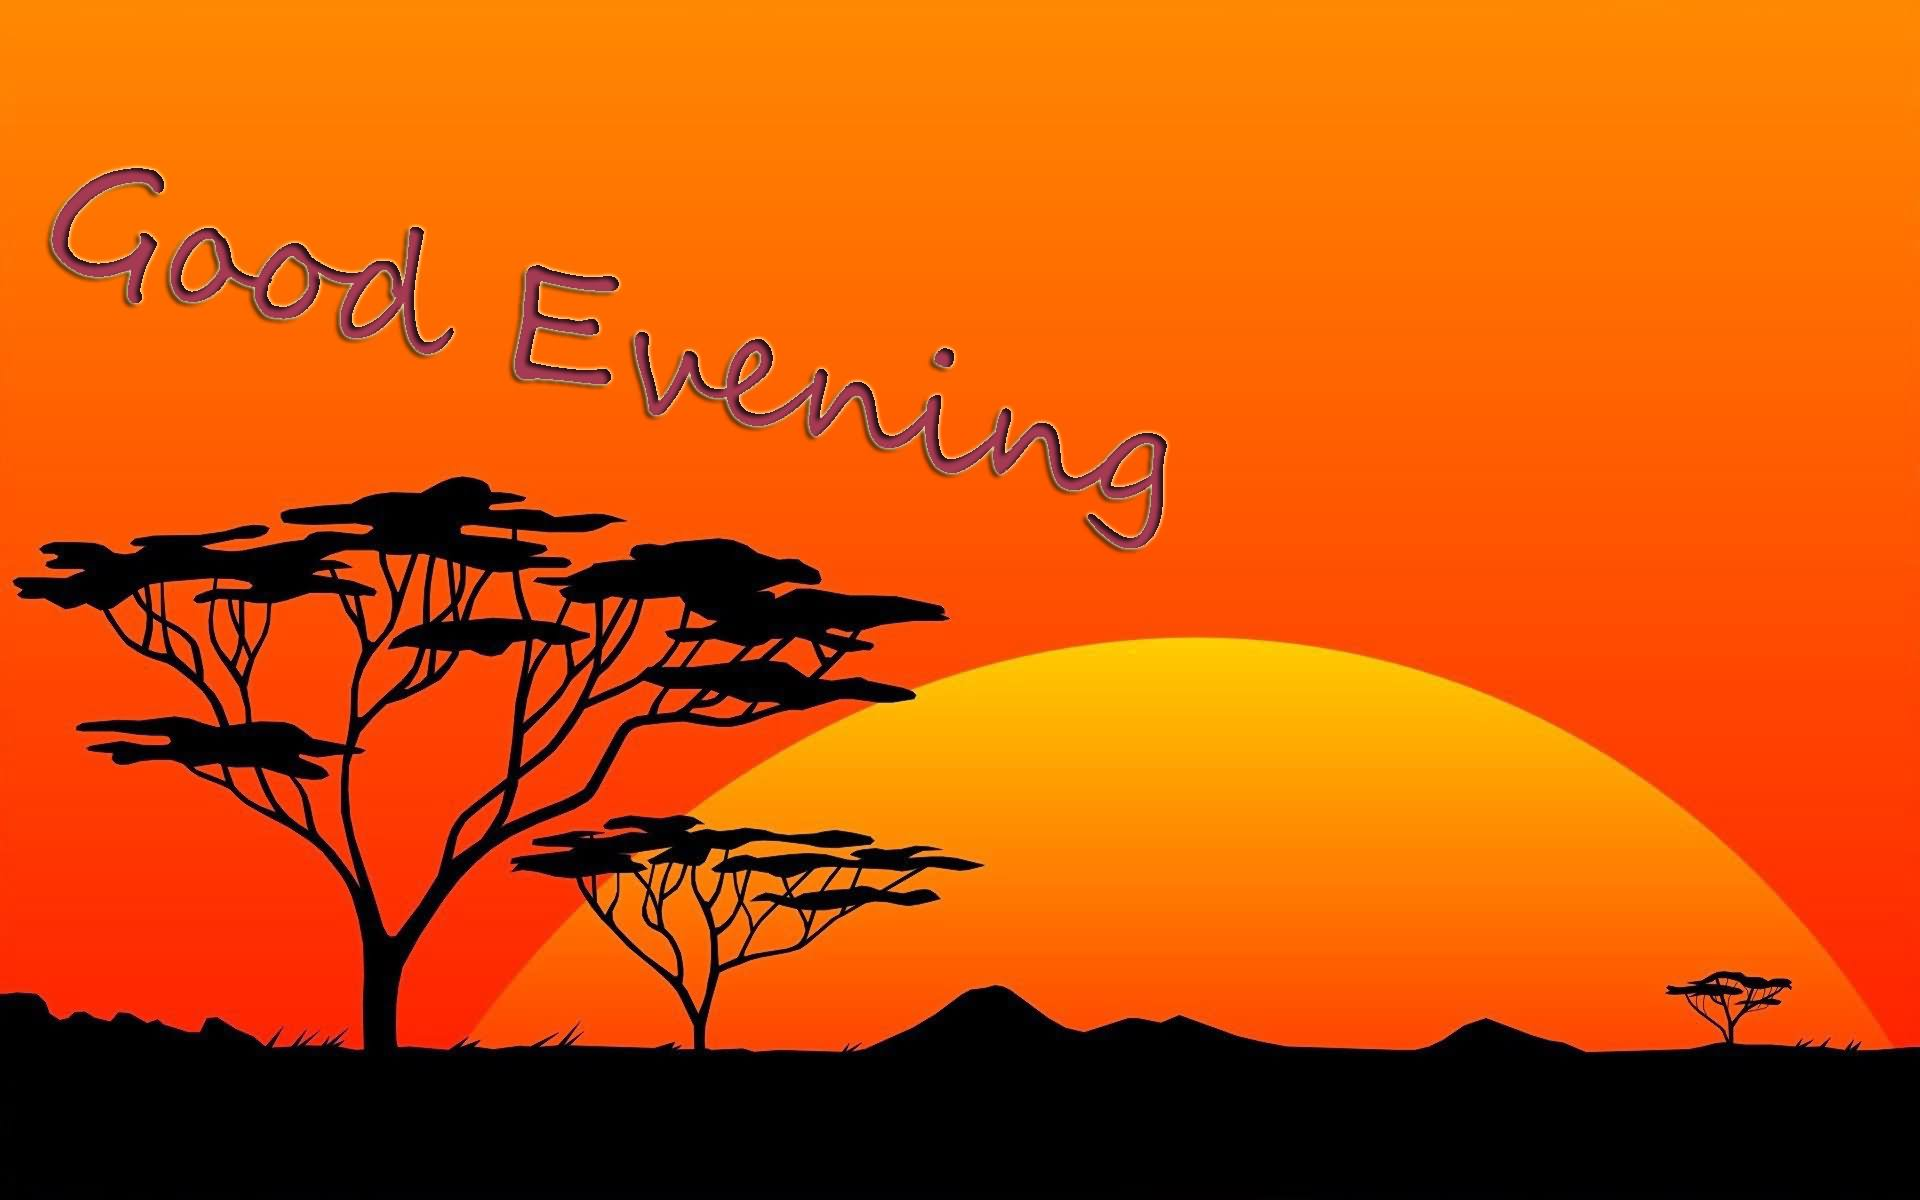 Good Evening Wish Sunset Art